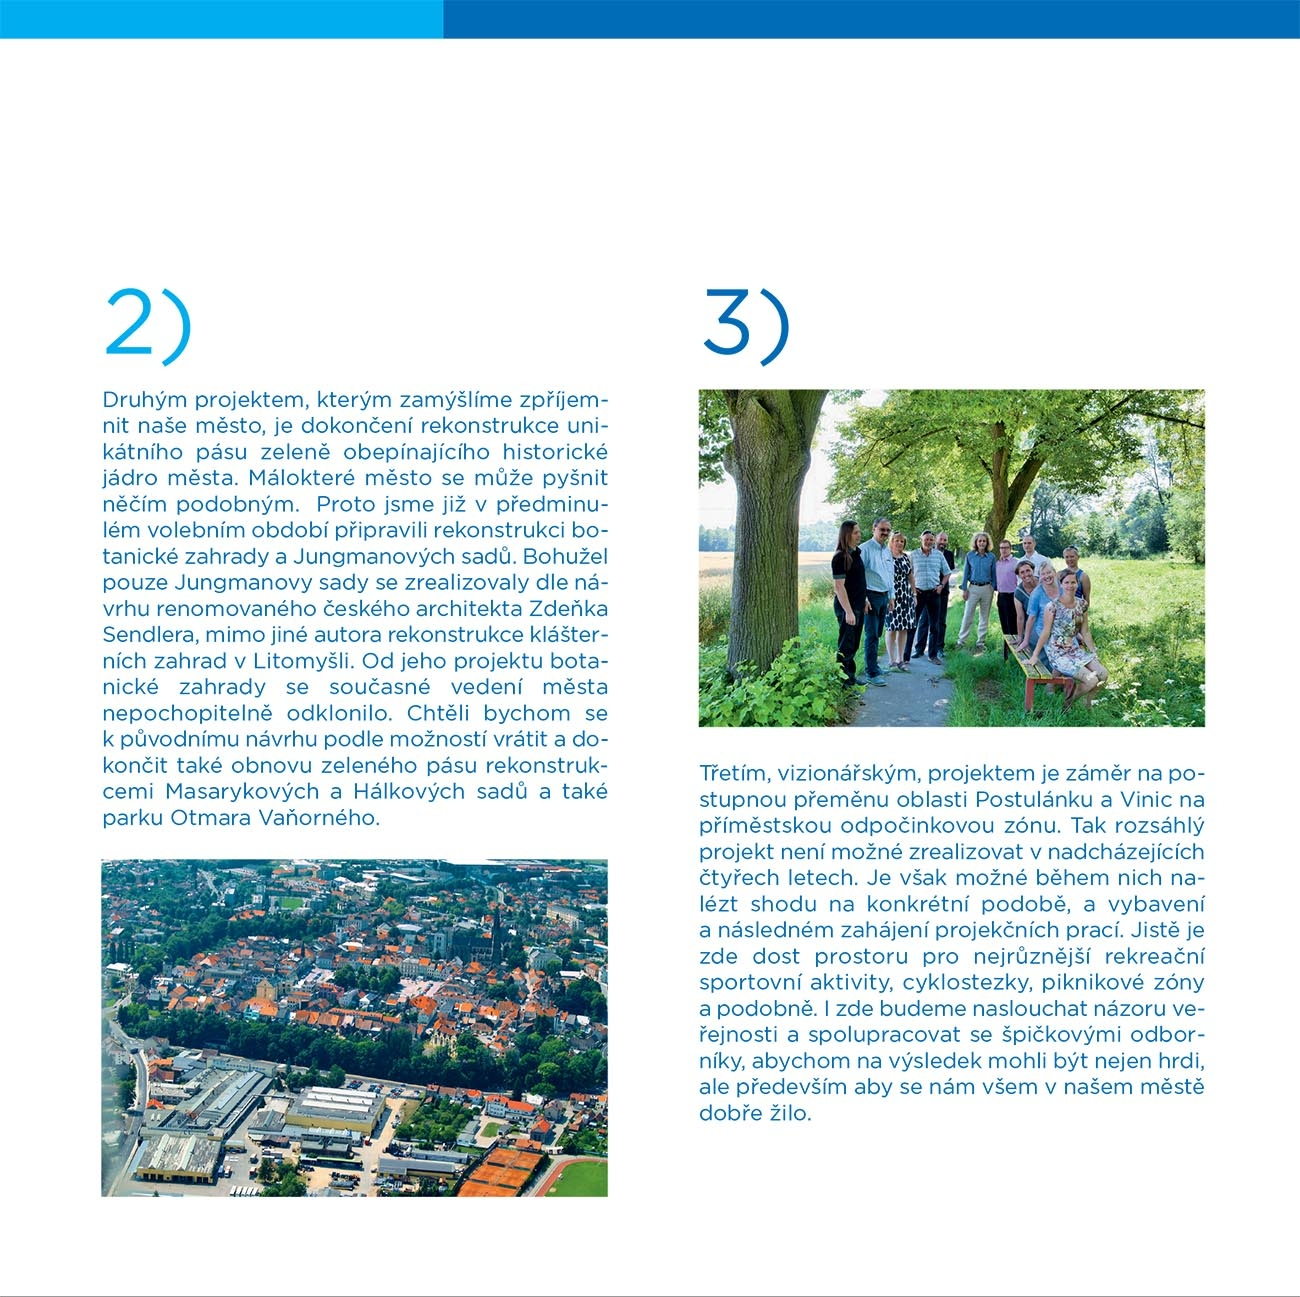 ODS-VM_2014_investicni_projekty_Sestava 1